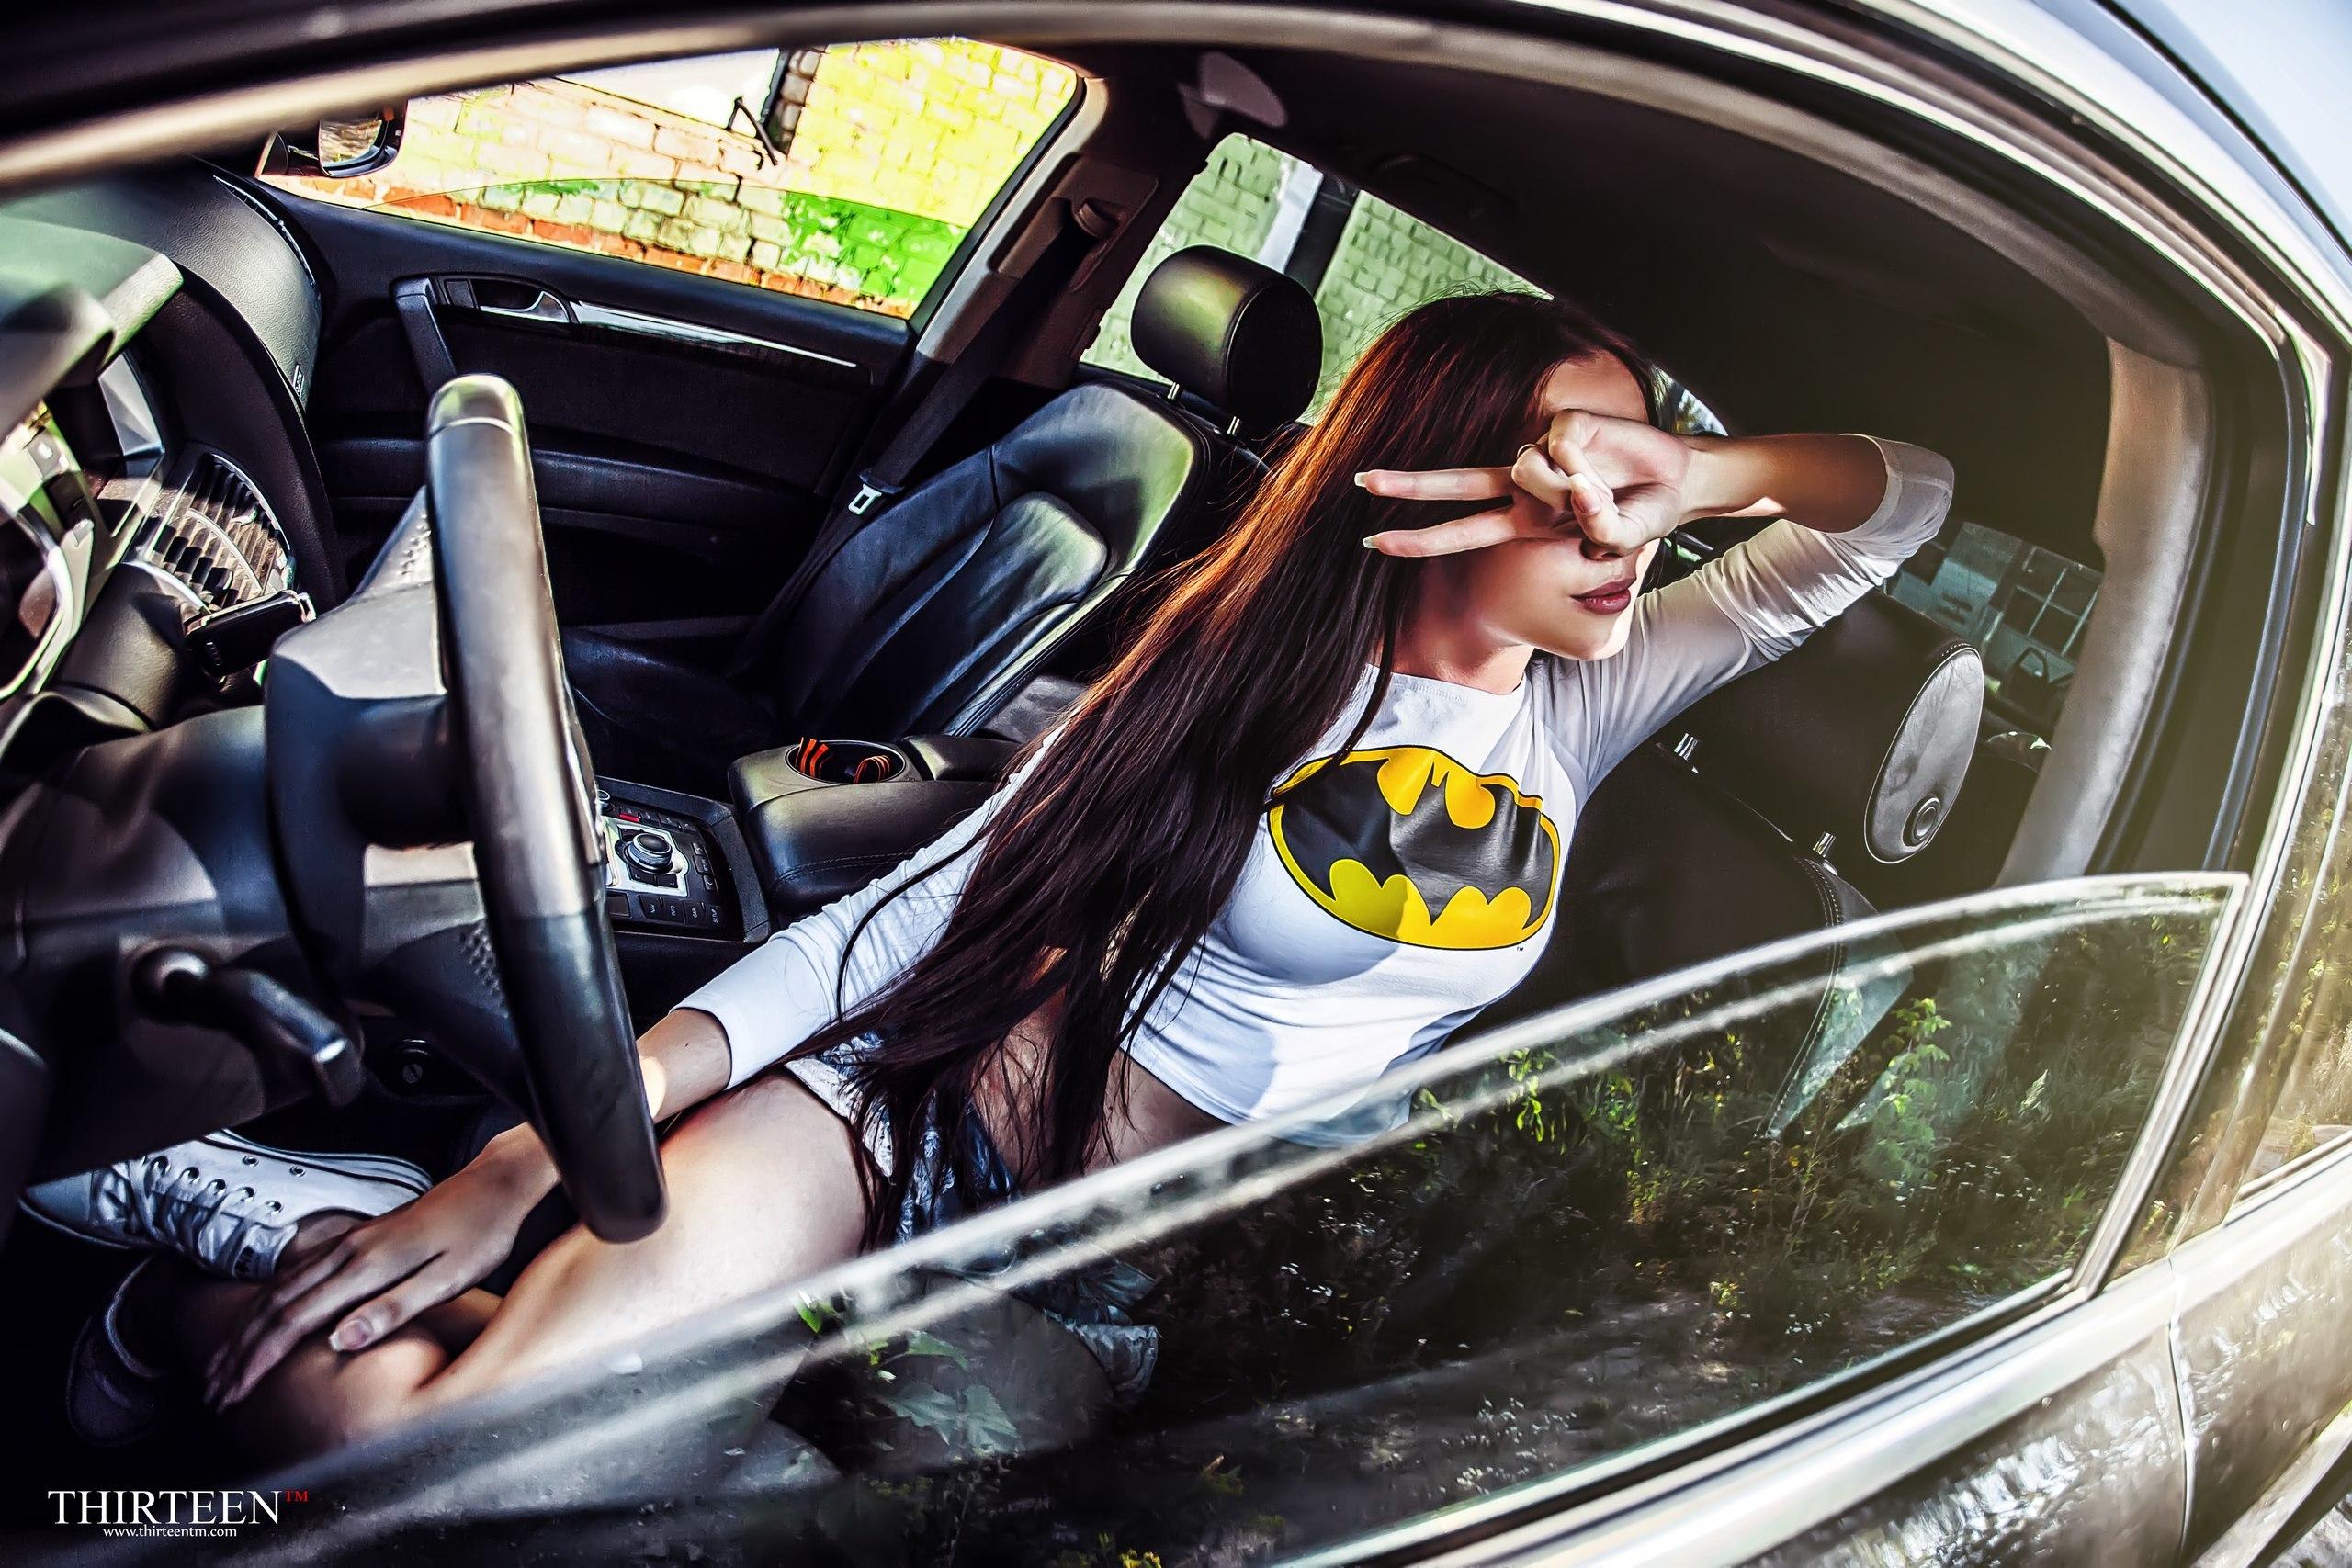 batgirl in a car.jpg